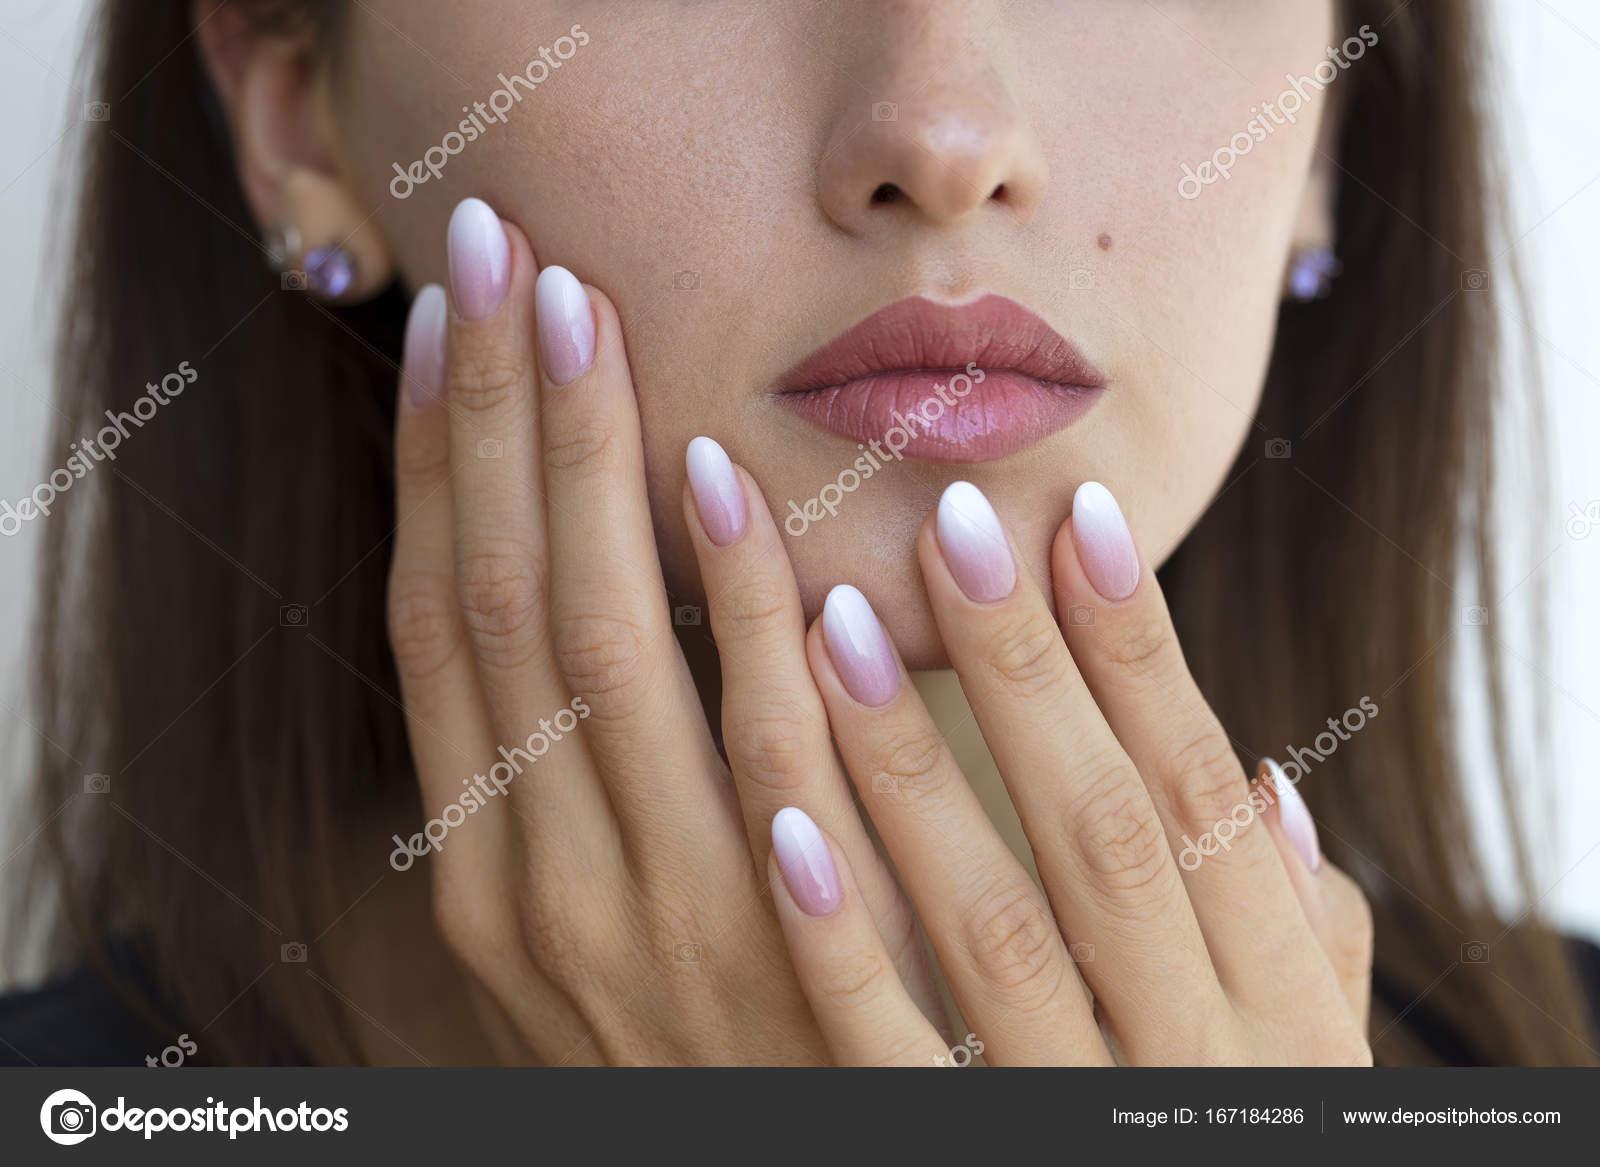 Piękna Kobieta Paznokcie Z Pięknym Francuski Manicure Ombre